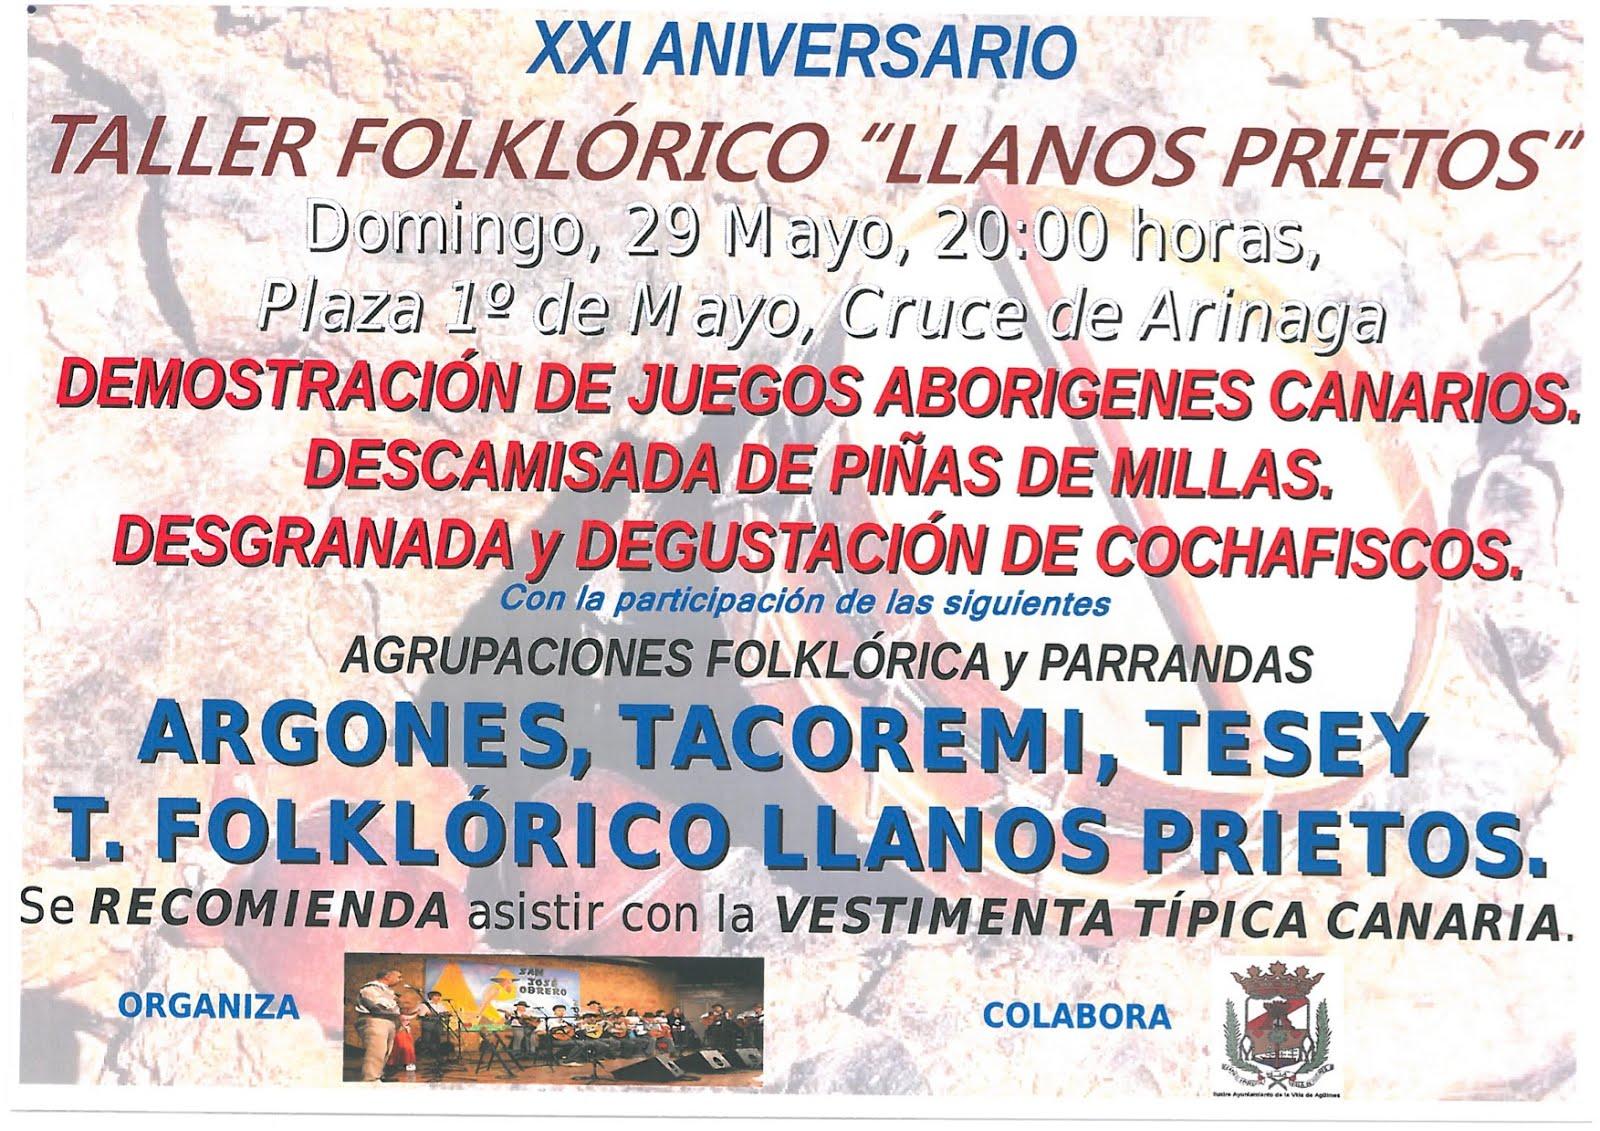 XXI aniversario T.F. Llanos Prietos